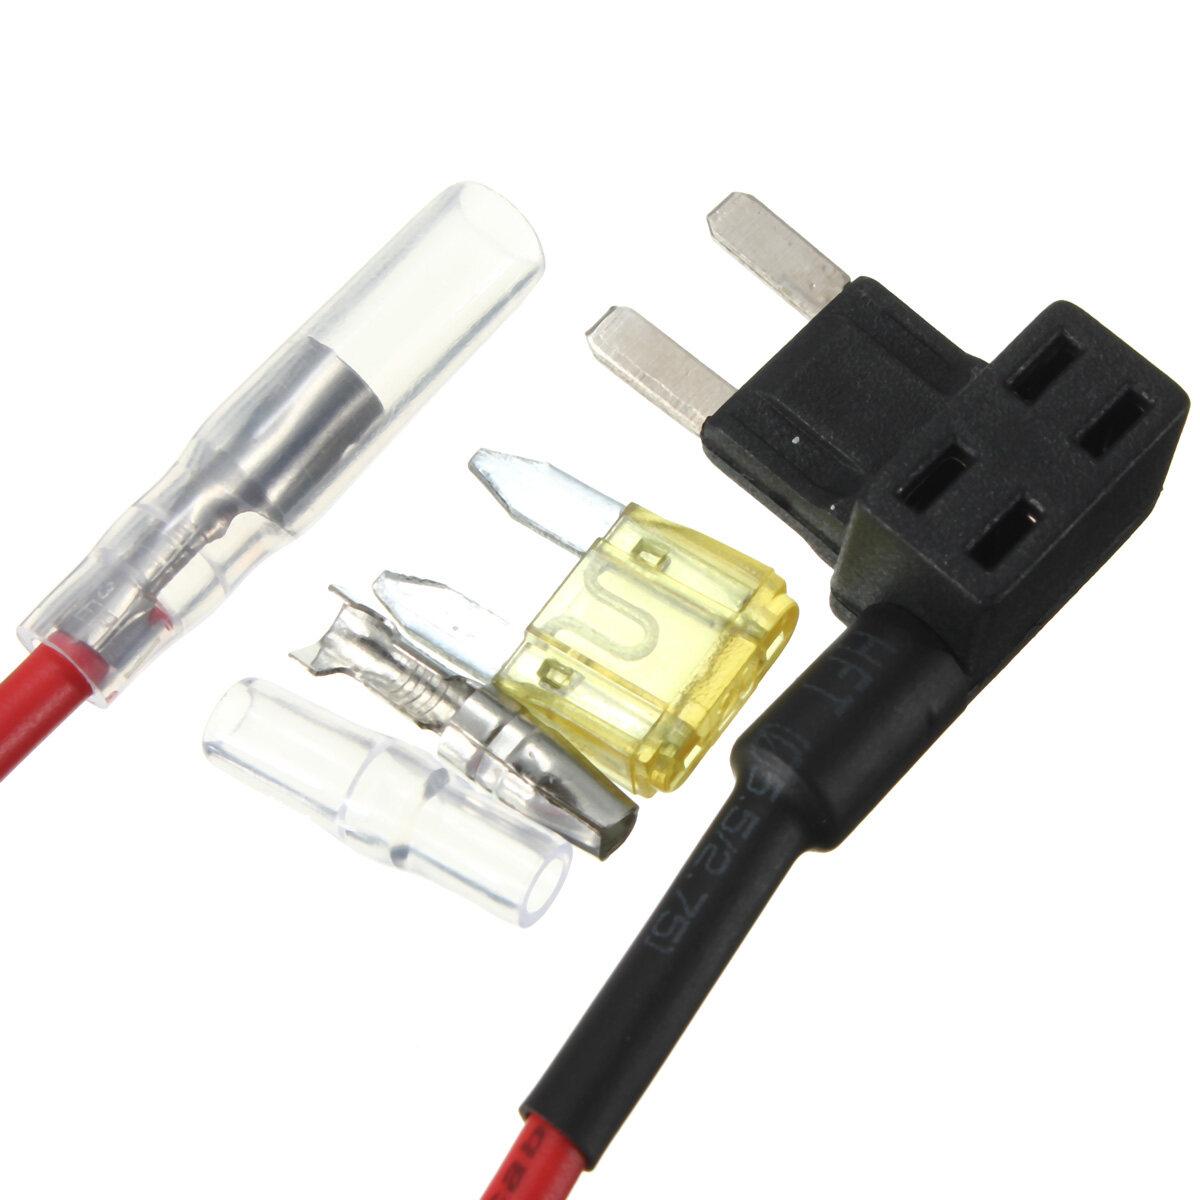 Buy Generic Acs J Add A Circuit Piggy Back Pluggable Standard Blade 07addacircuitjpg Tap Fuse Holder Best Price Online Jumia Kenya